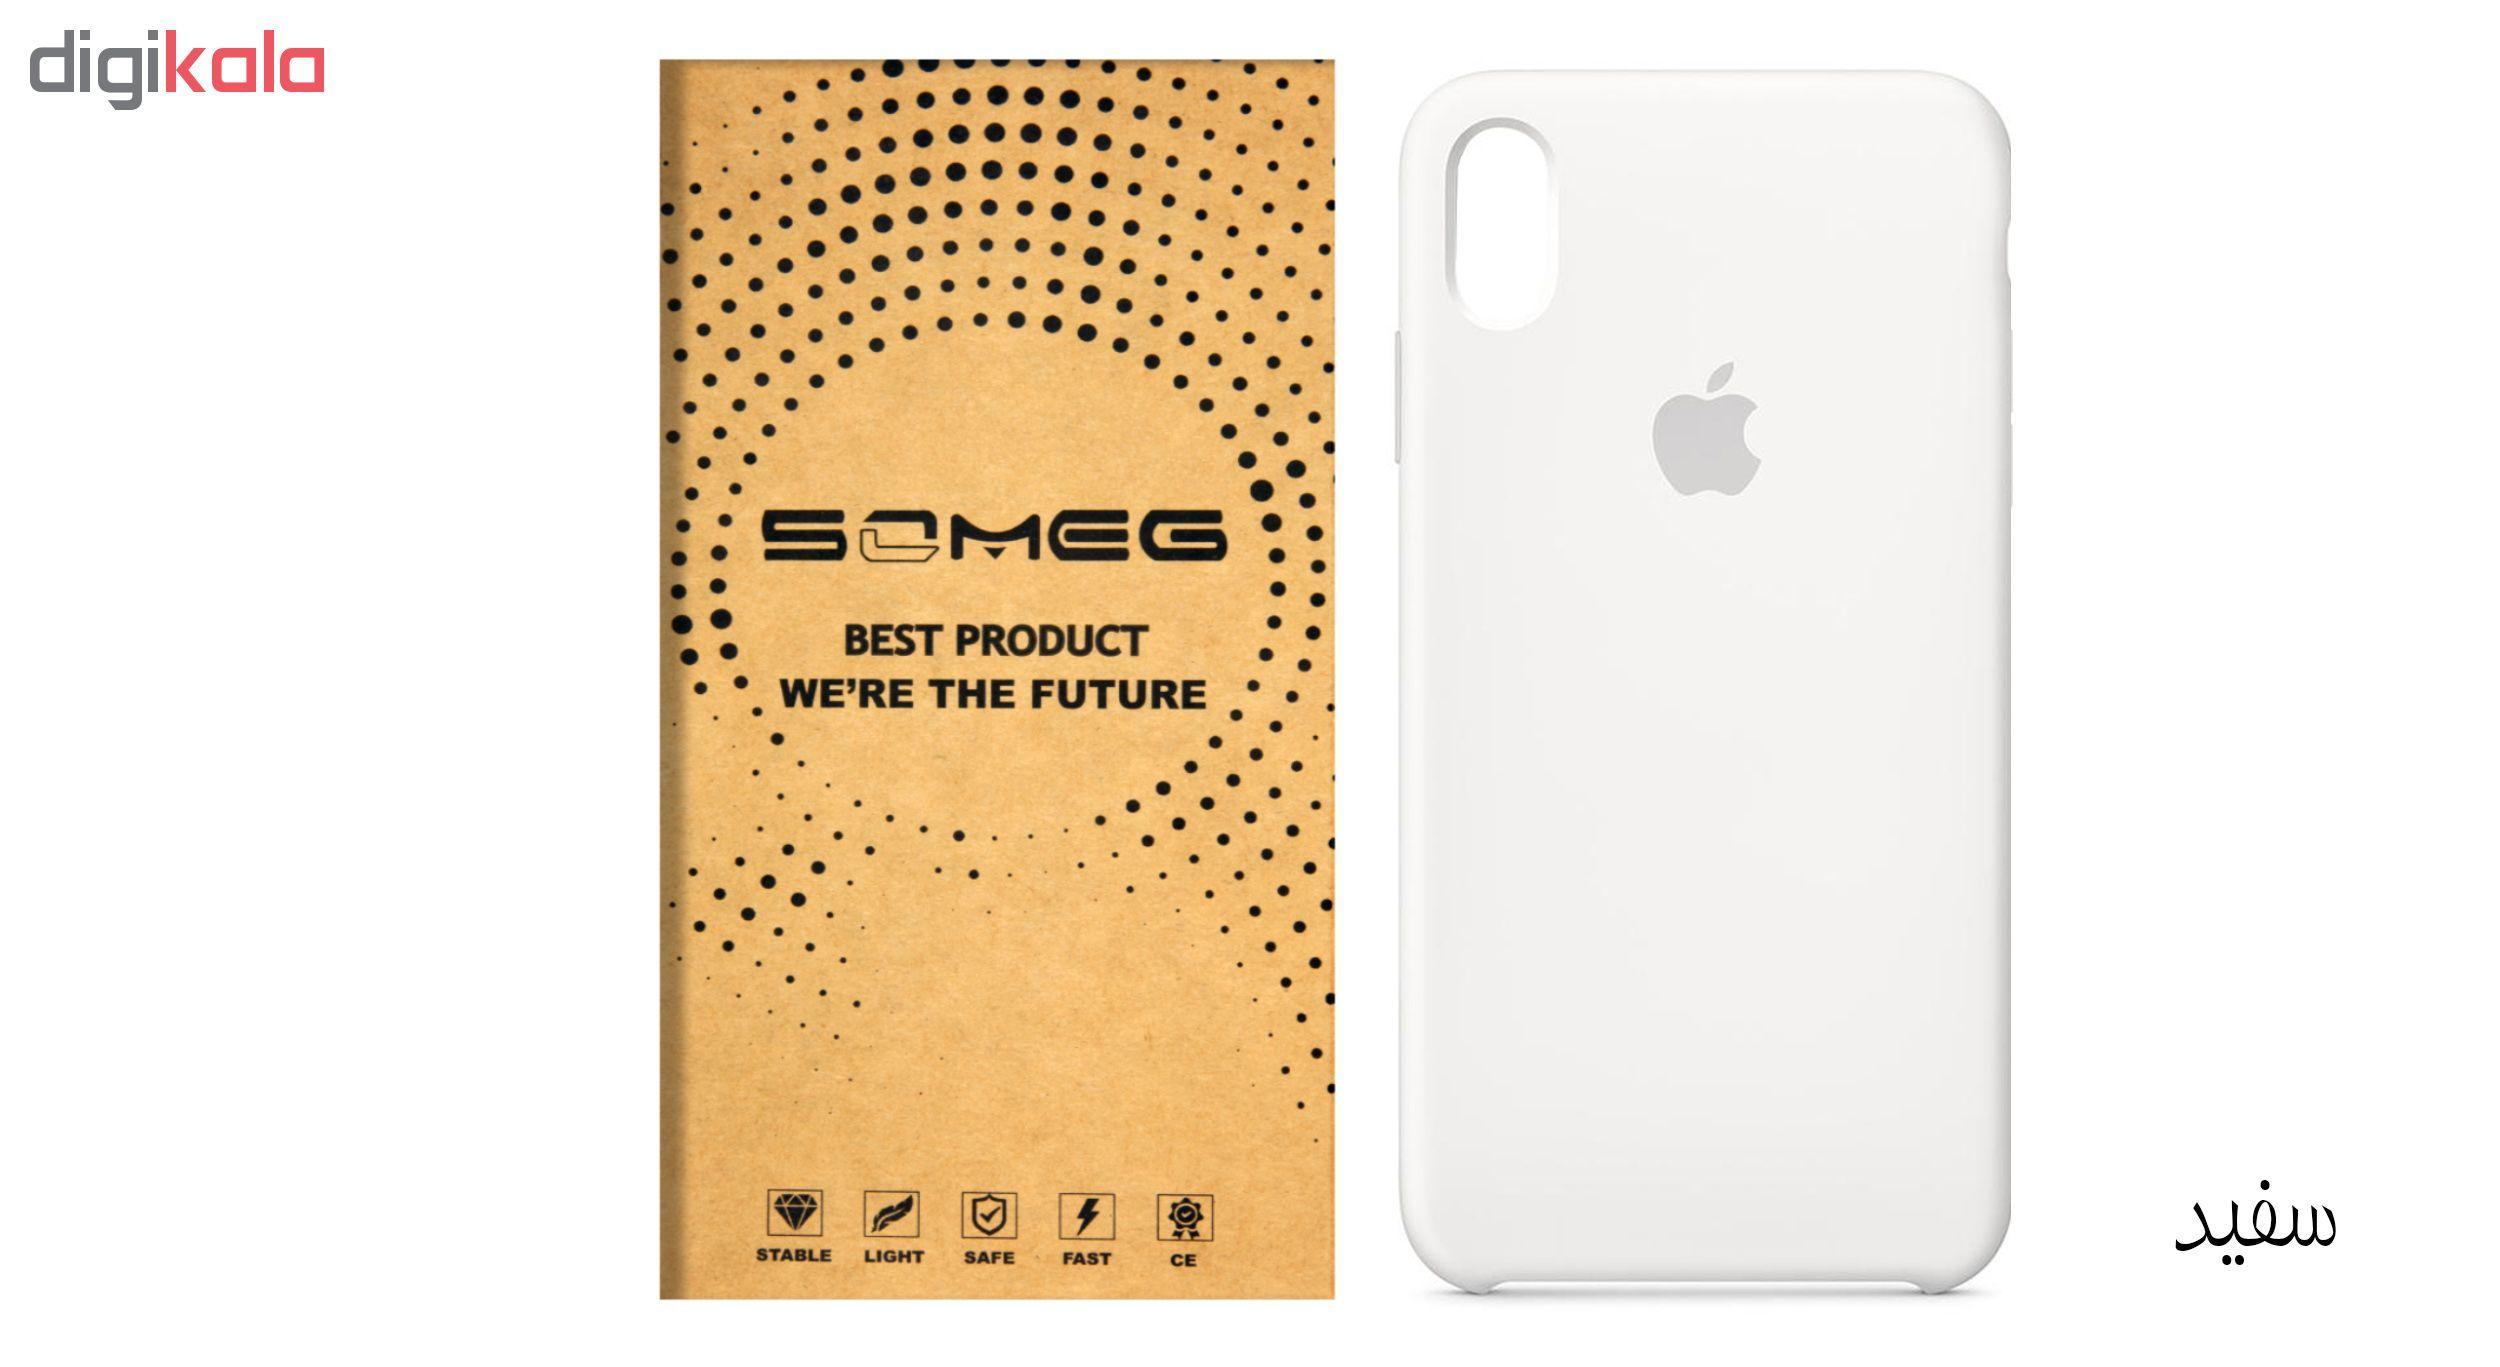 کاور سومگ مدل SIC مناسب برای گوشی موبایل اپل iPhone X  main 1 33